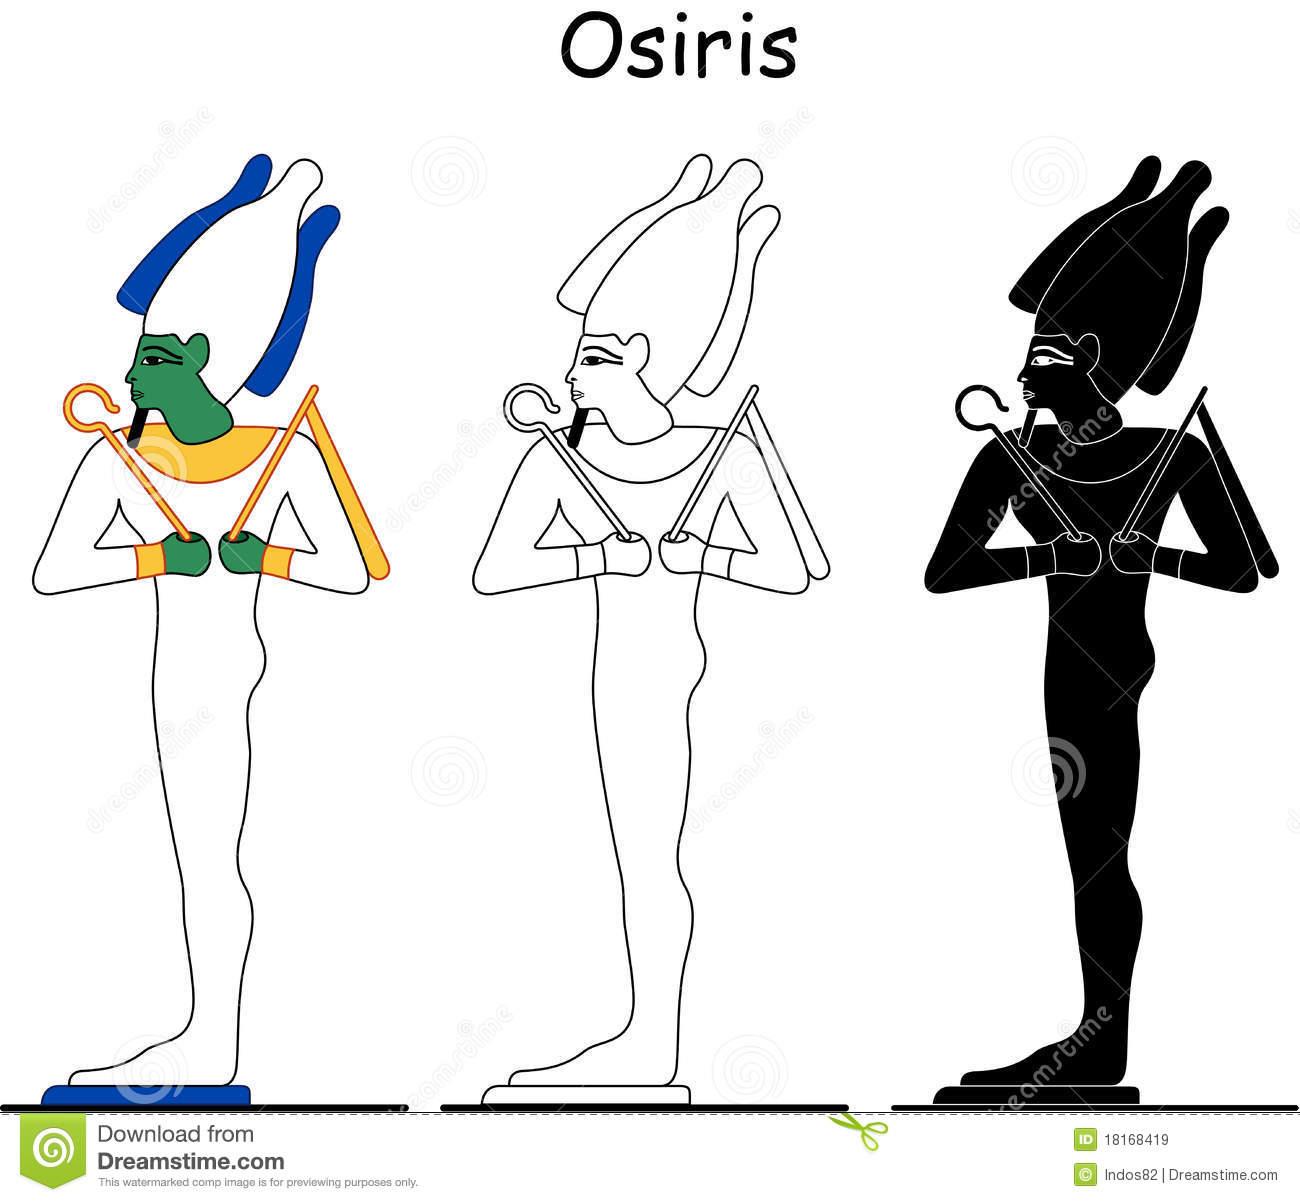 Osiris clipart #17, Download drawings